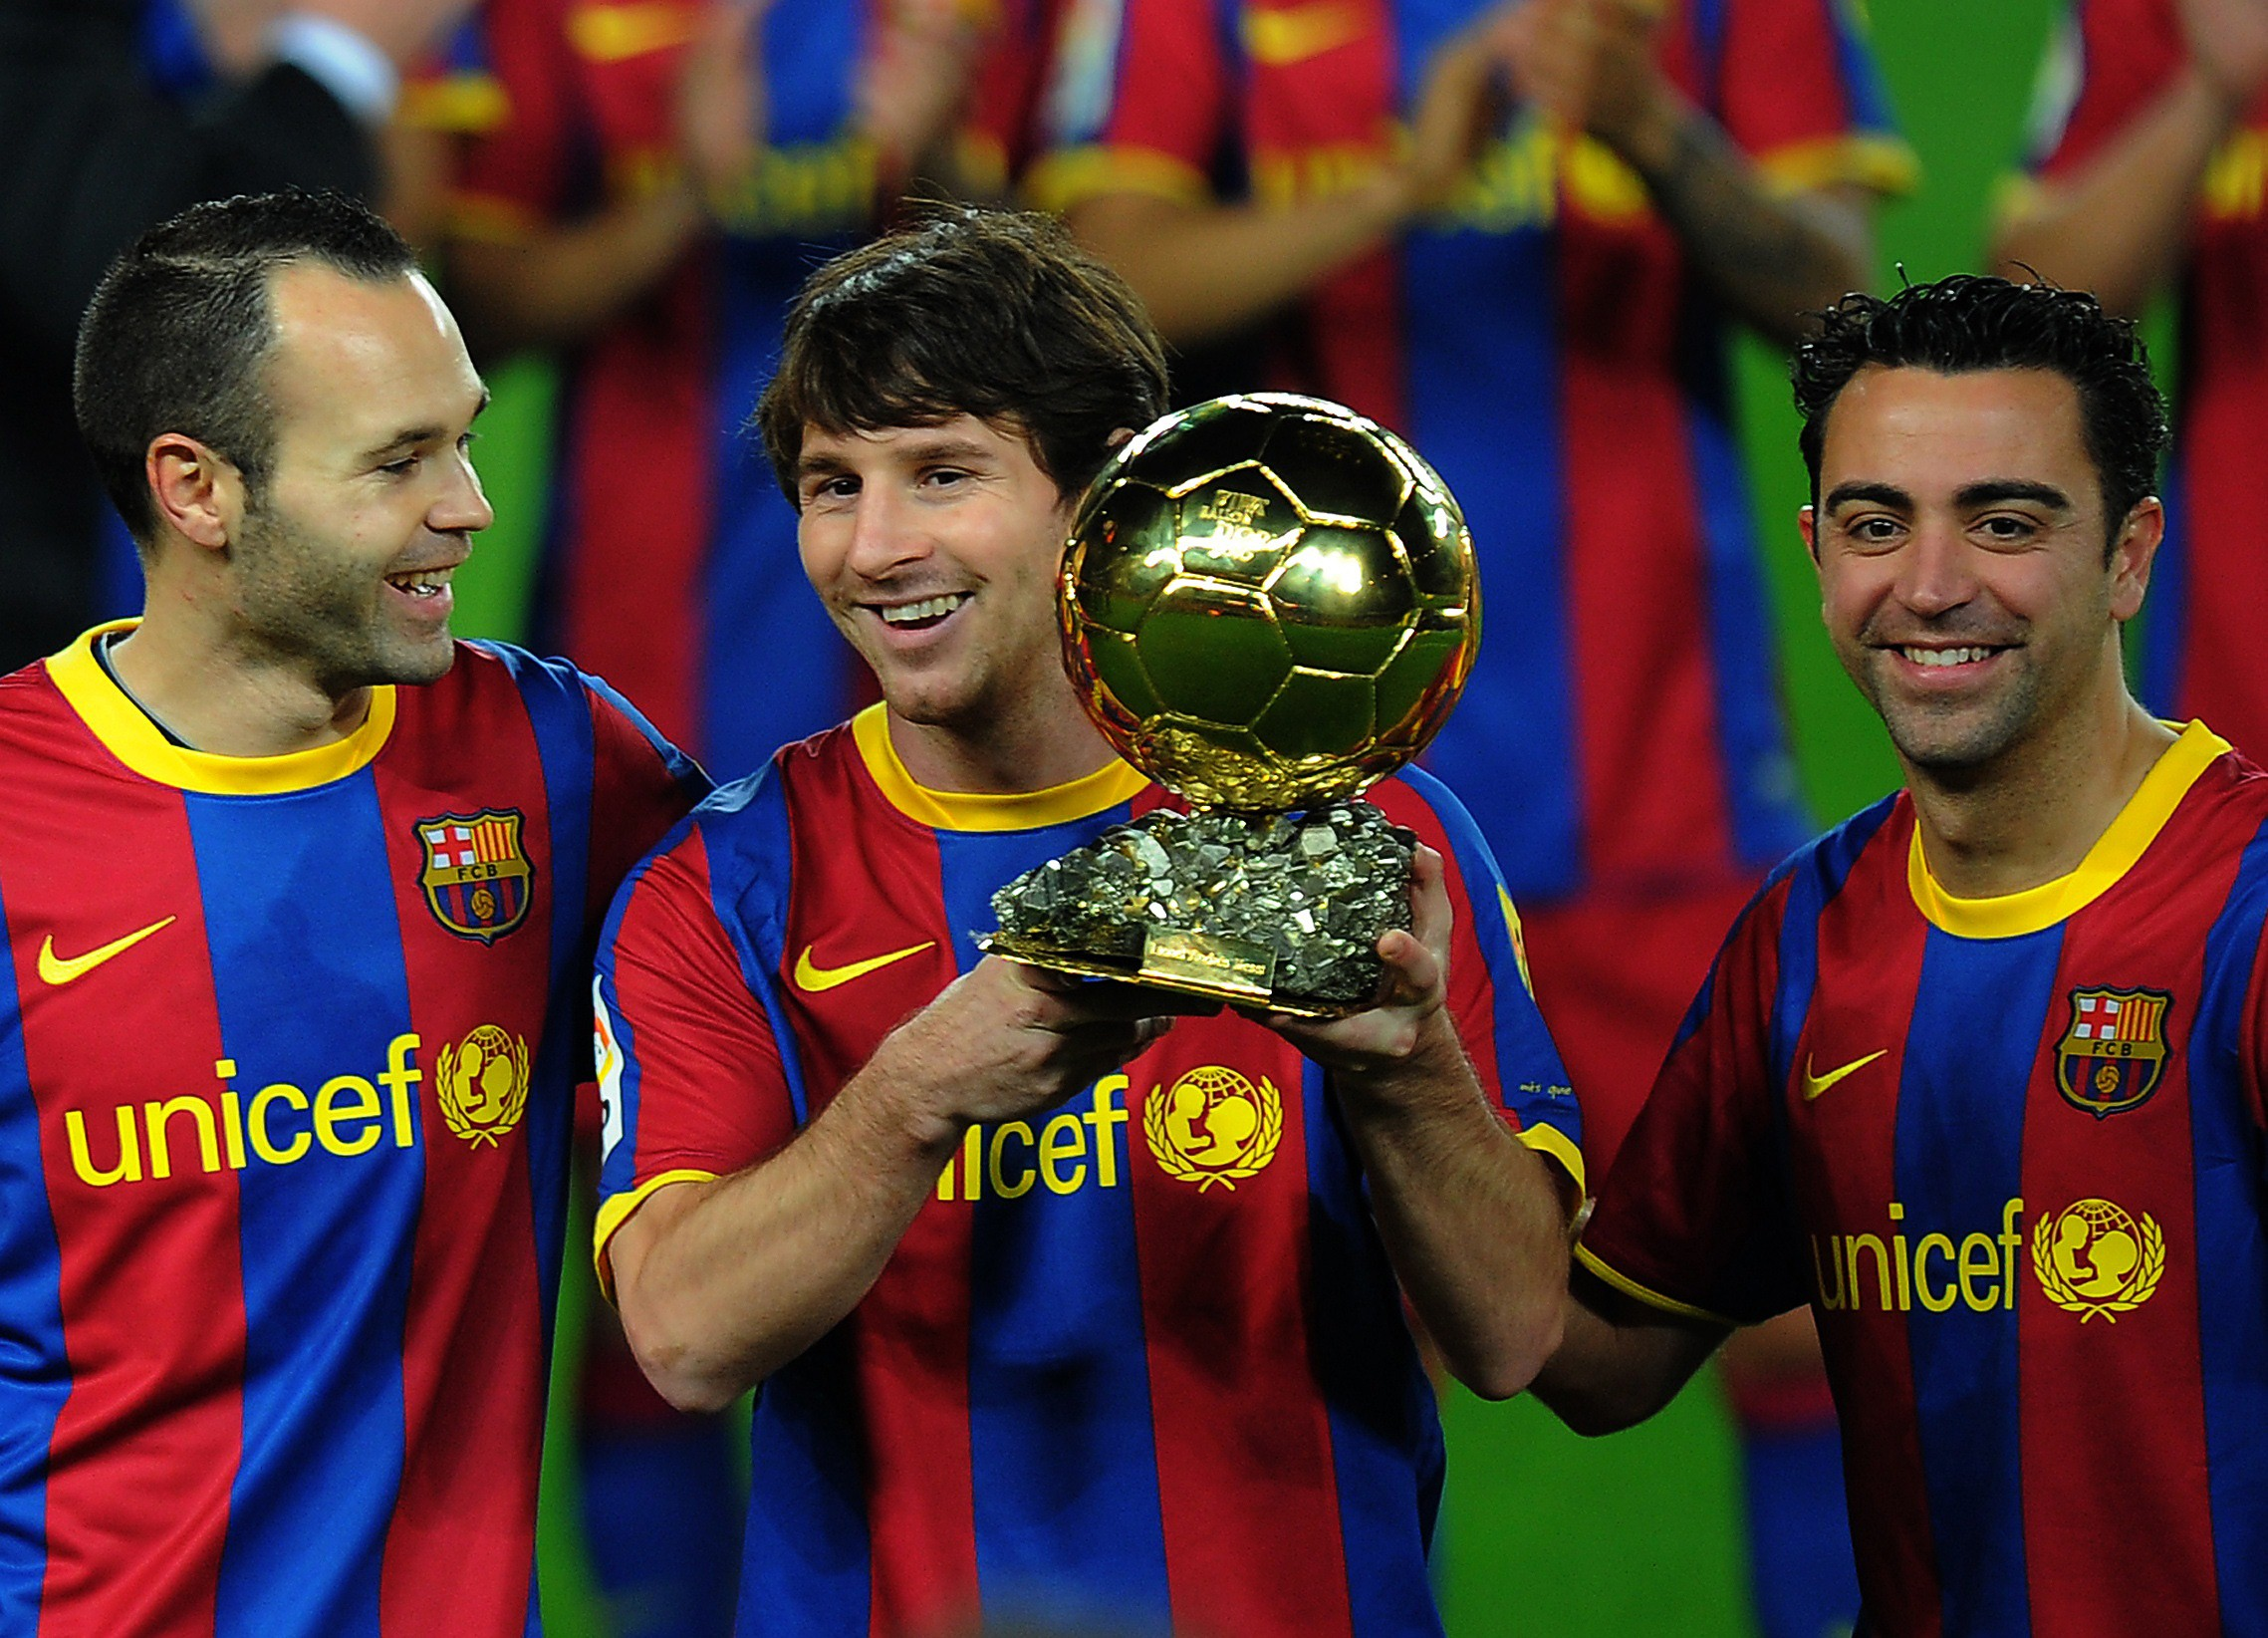 Messi_Xavi_Iniesta Barça-Betis 2011 - AFP